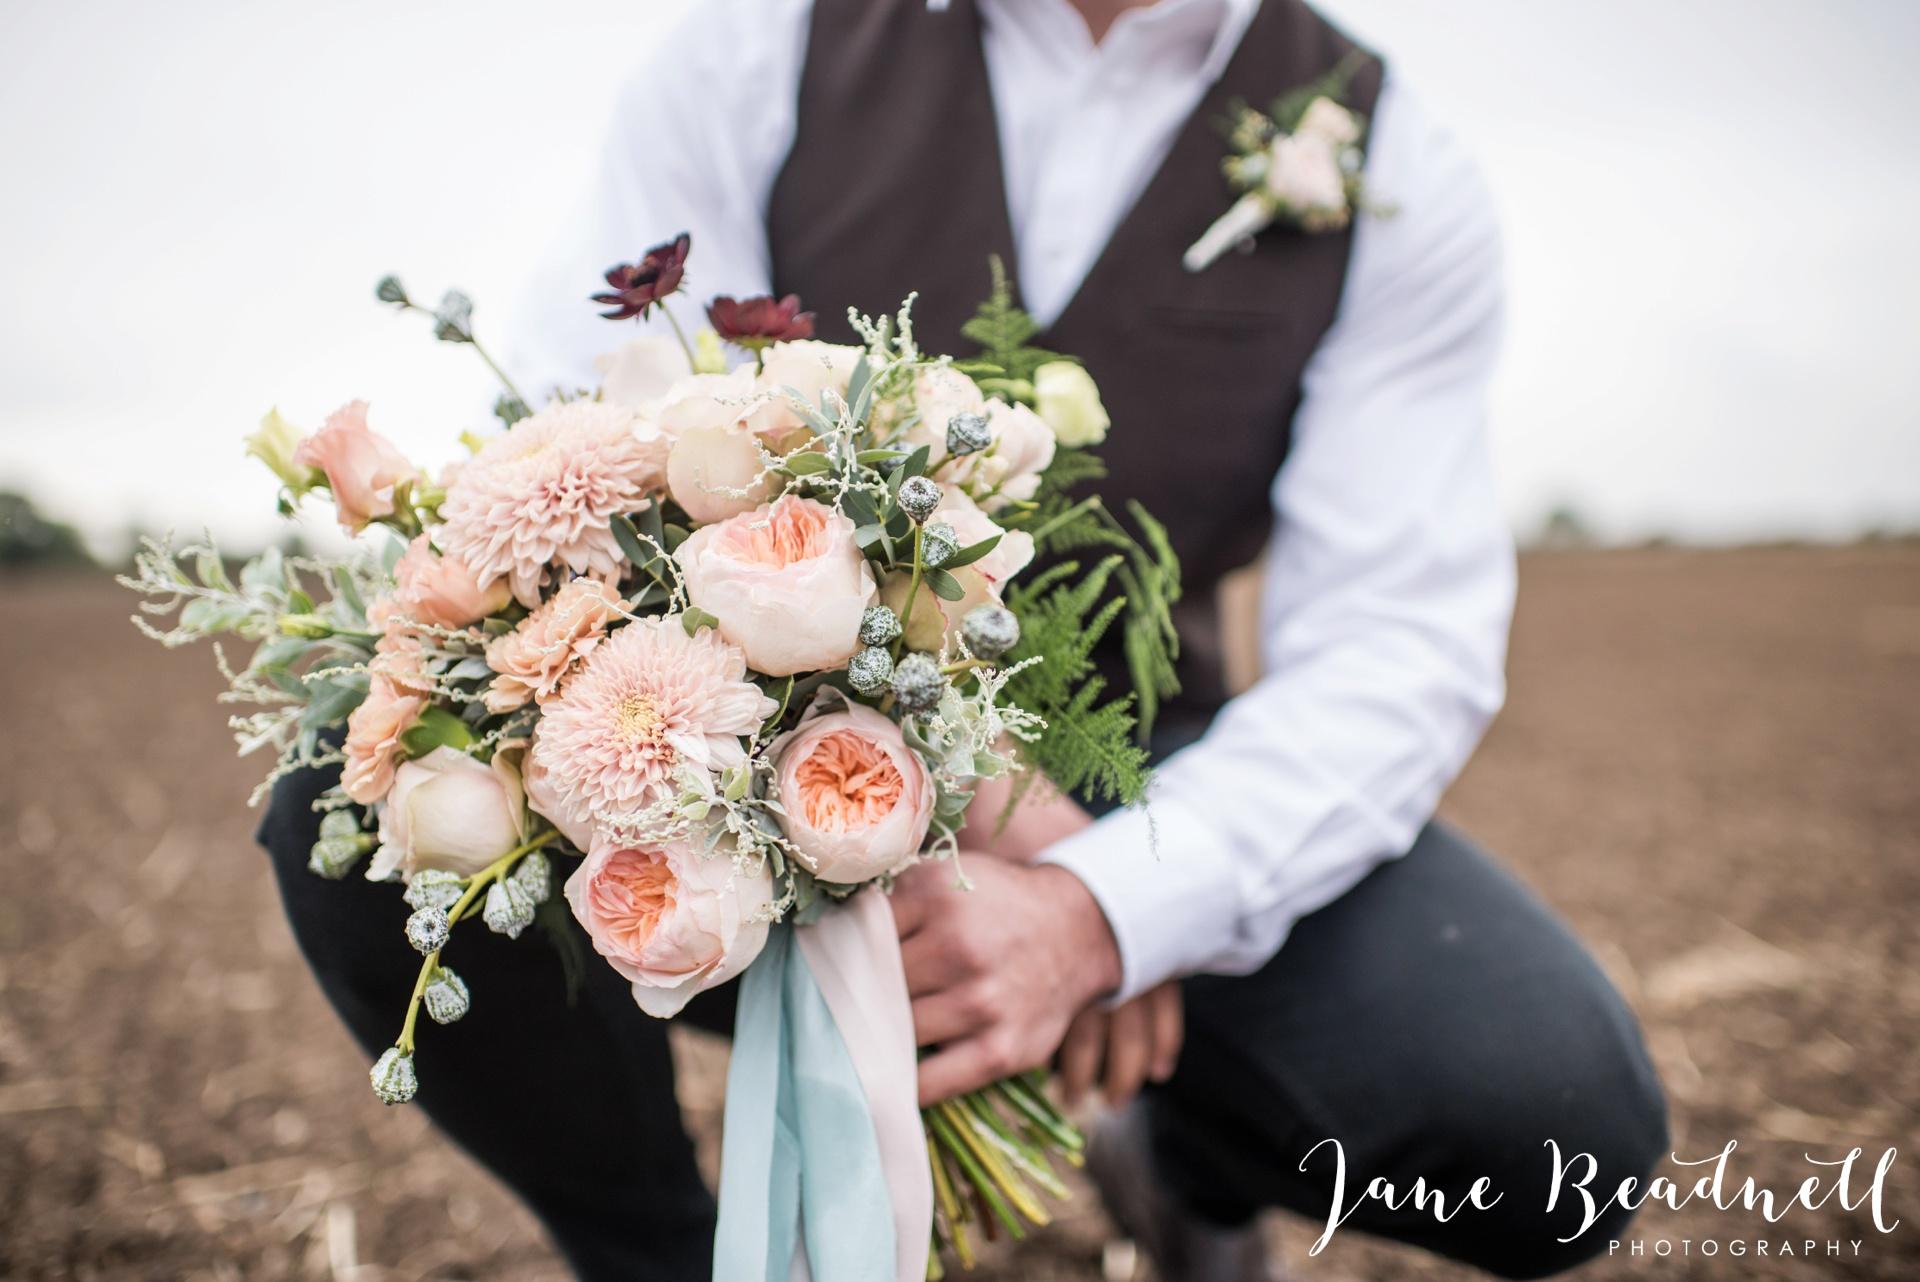 fine-art-wedding-photographer-jane-beadnell-photography_0002